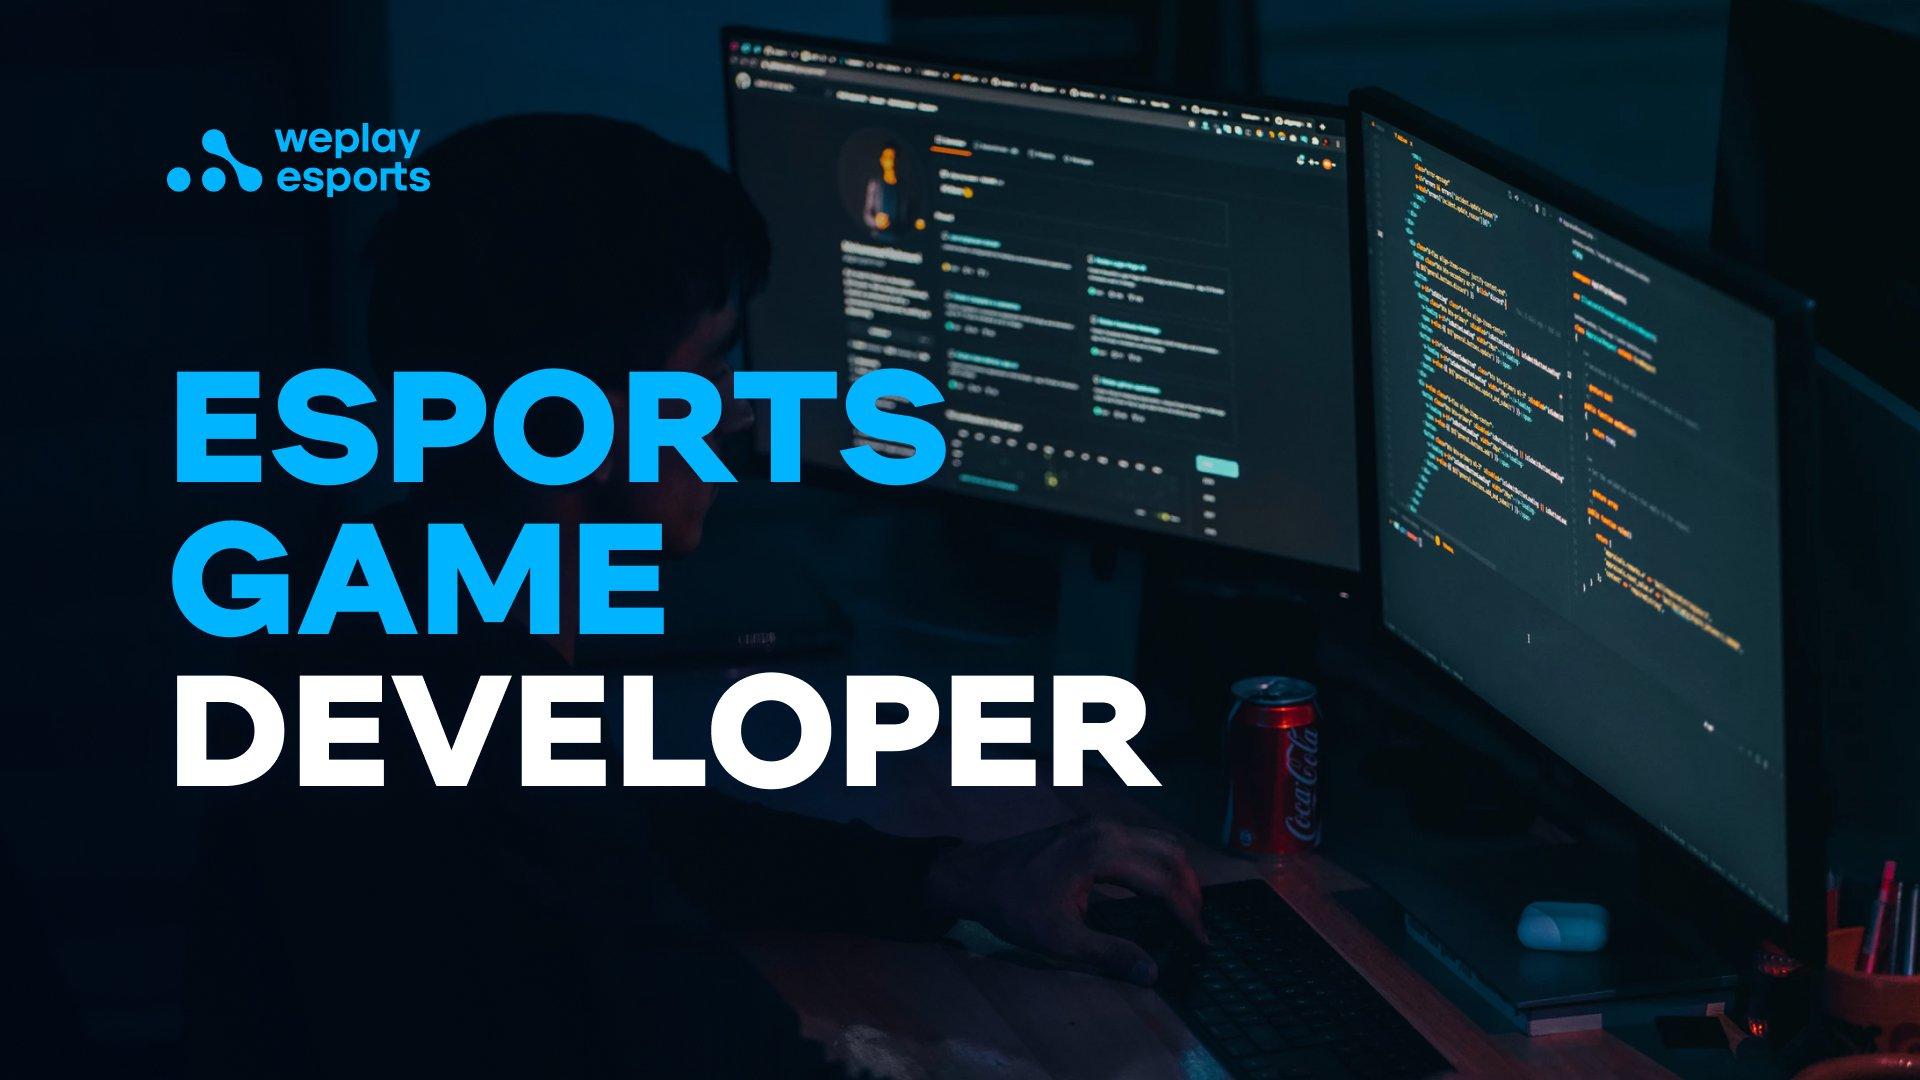 Esport Game Developer